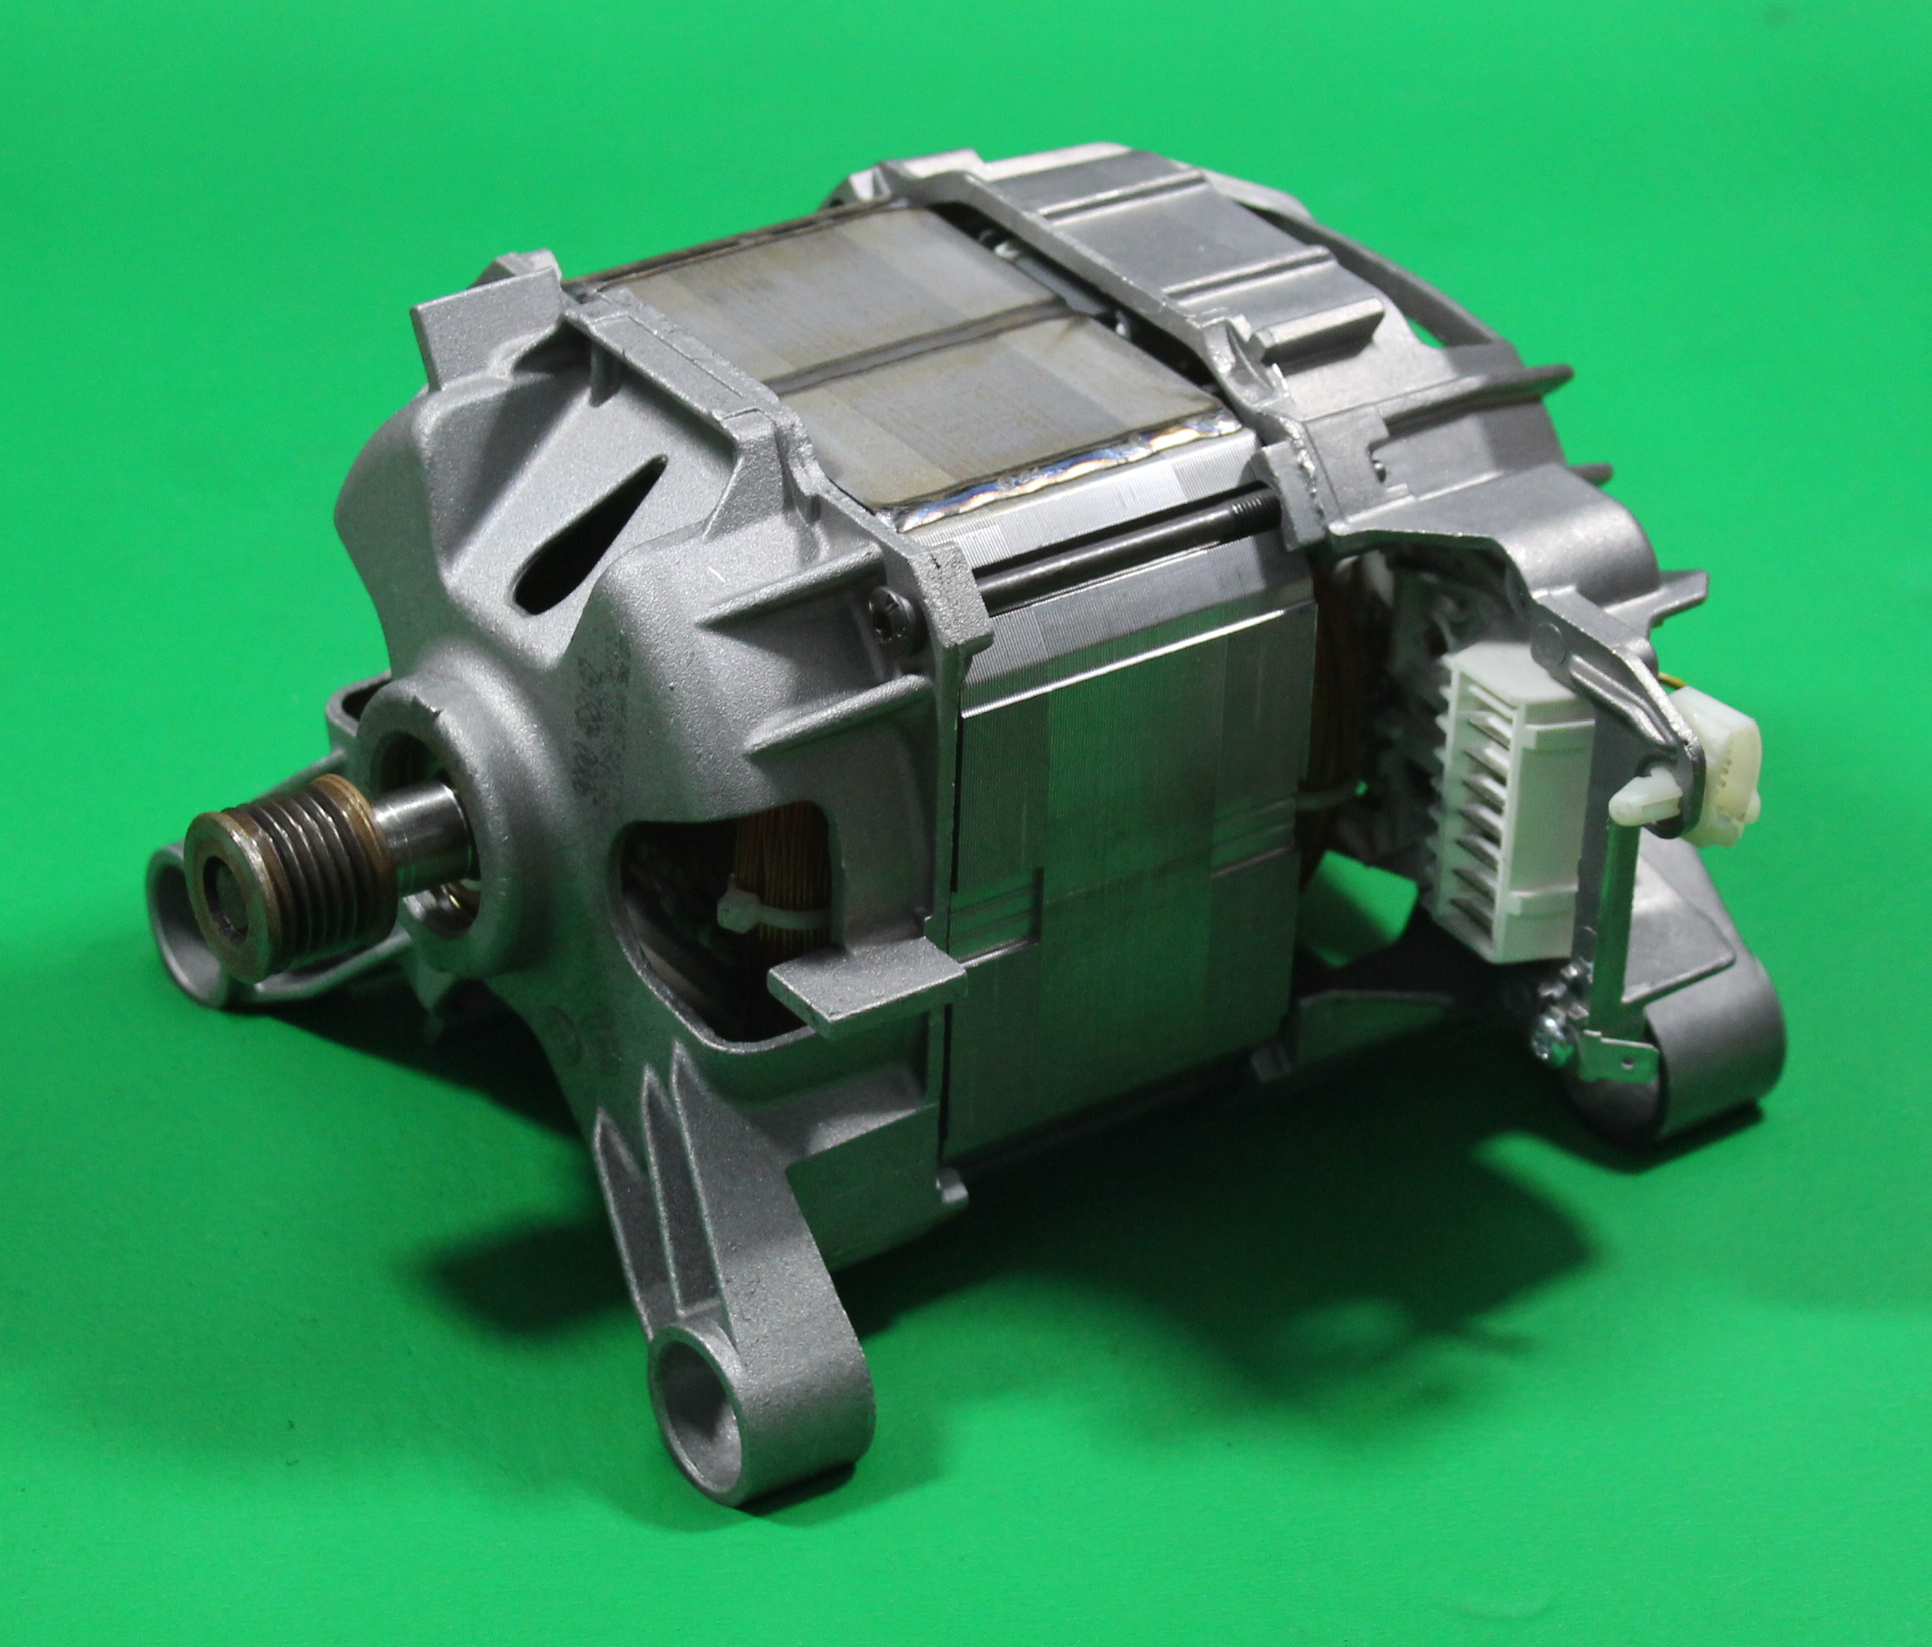 Bosch waq28461gb 12 washing machine motor 9000488142 151 for Motor for bosch washing machine